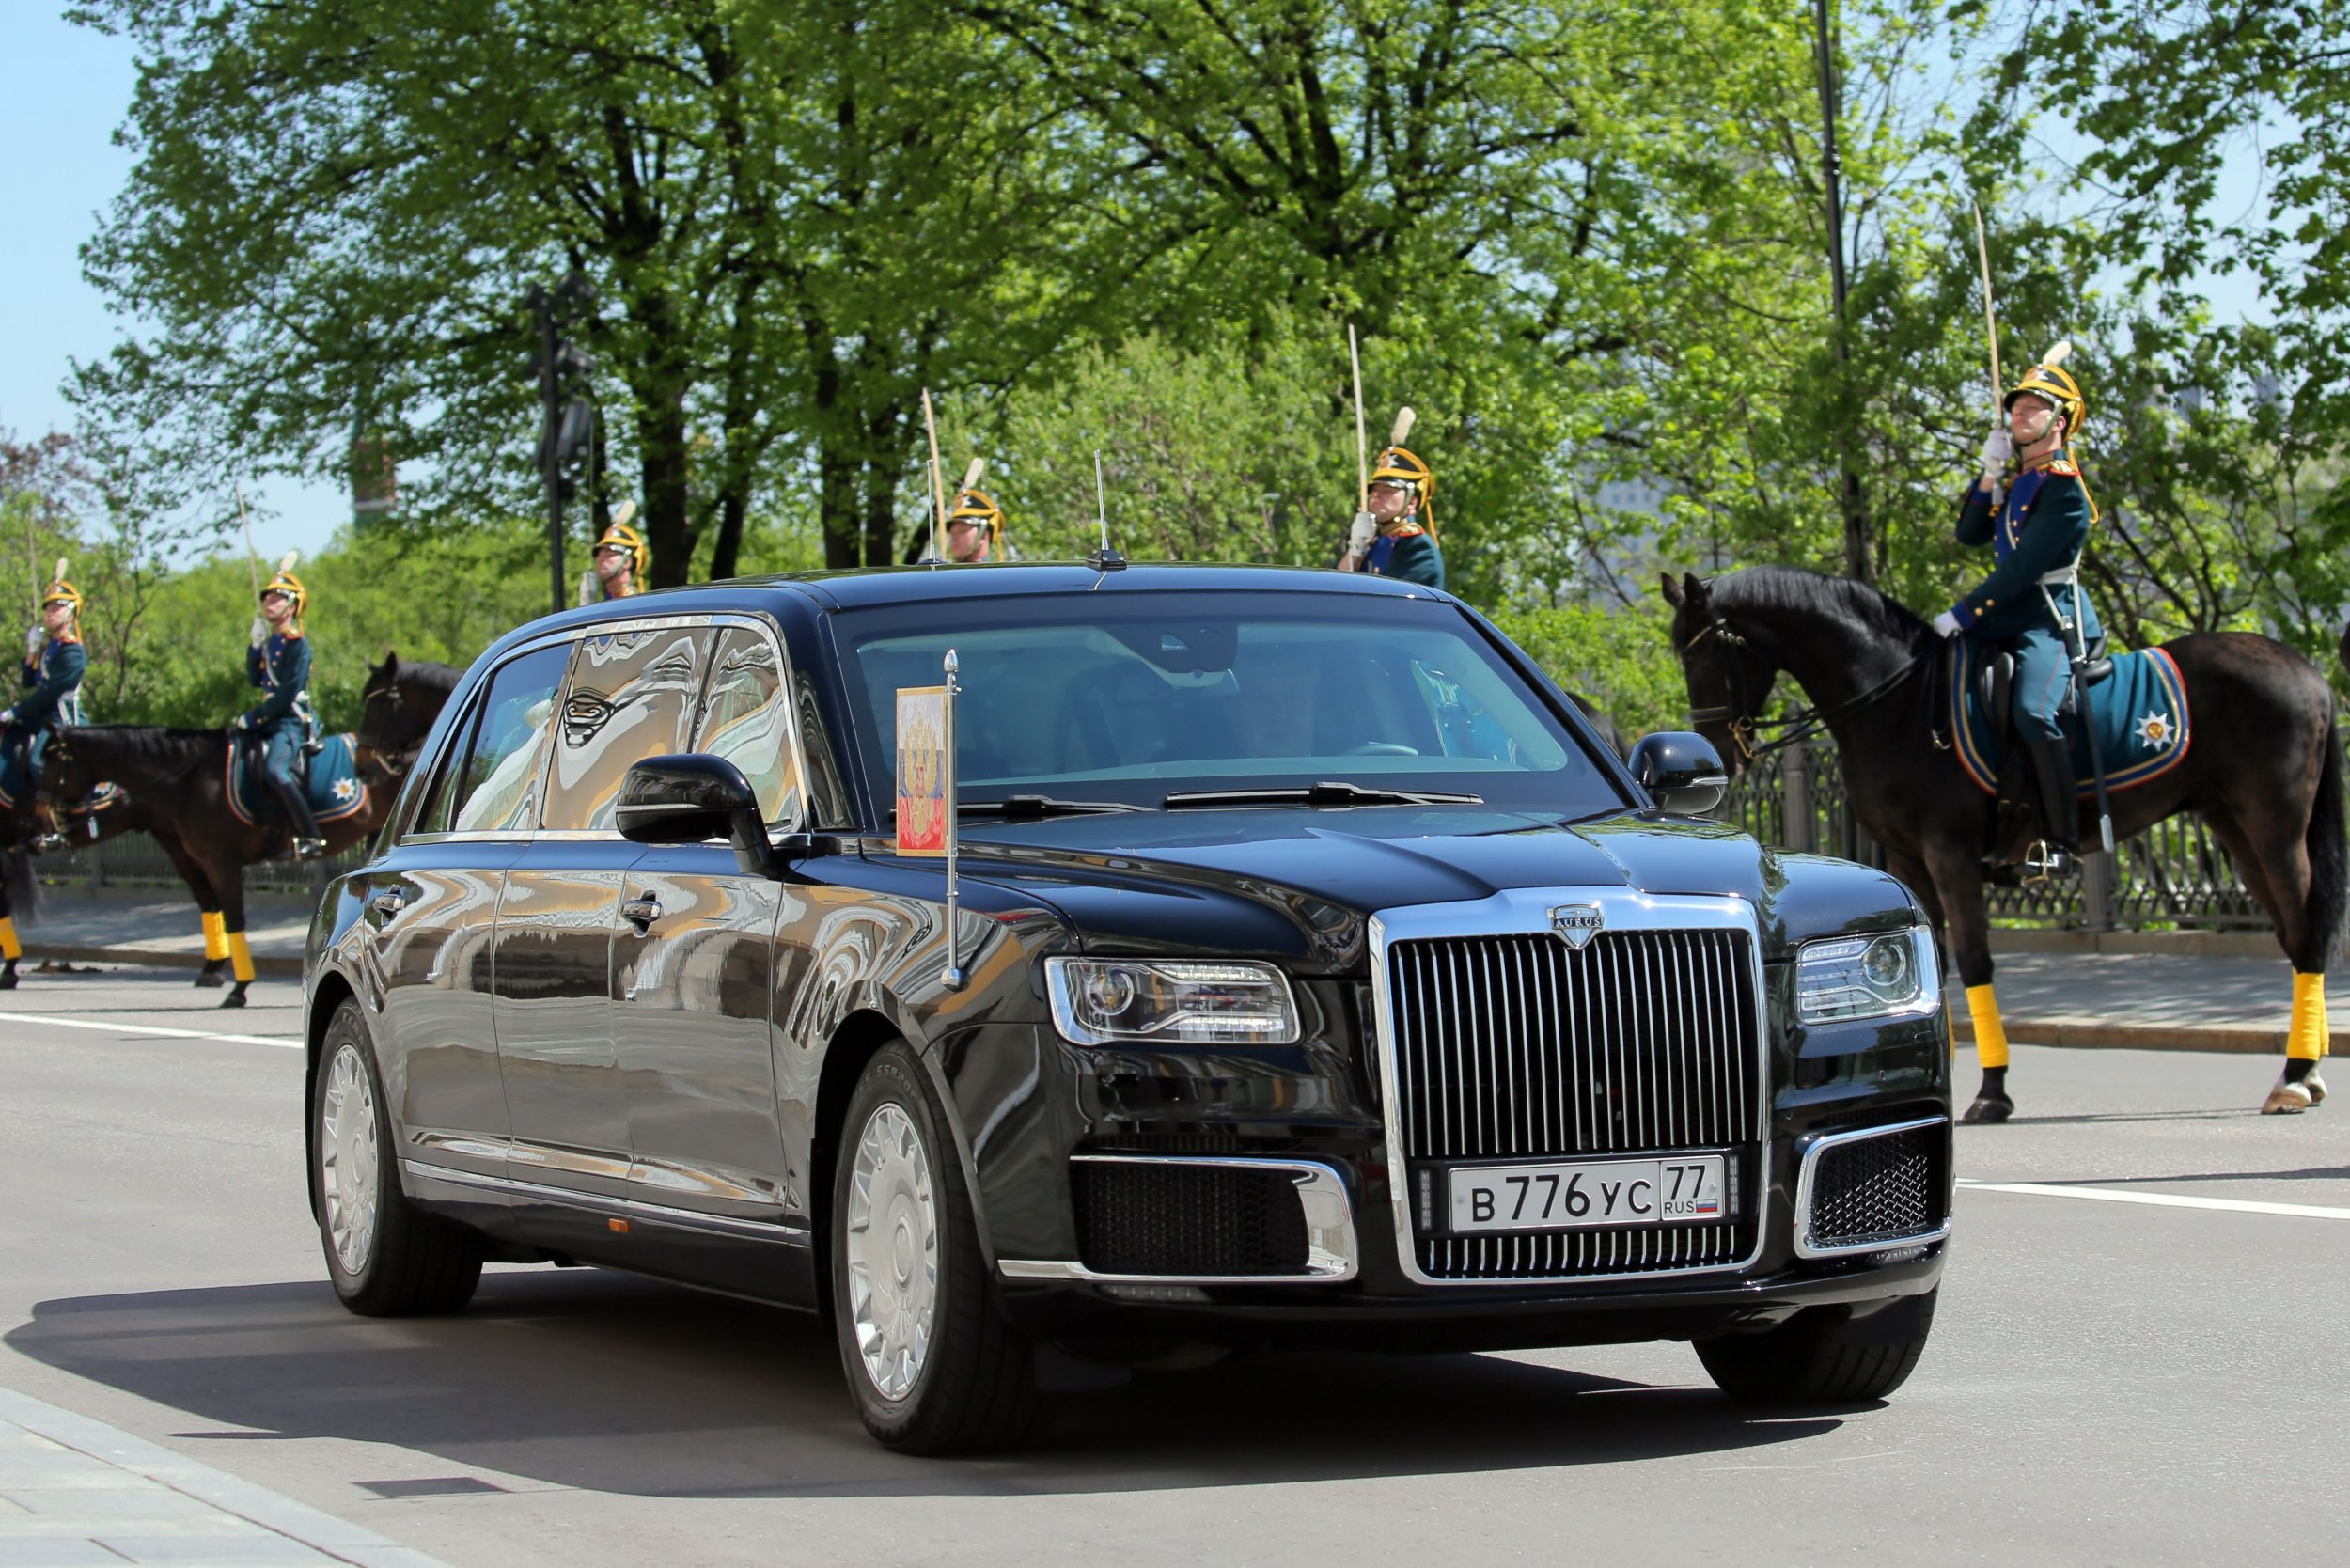 Vladimir Putin S New Bulletproof Limo Fleet Cost 192 Million And